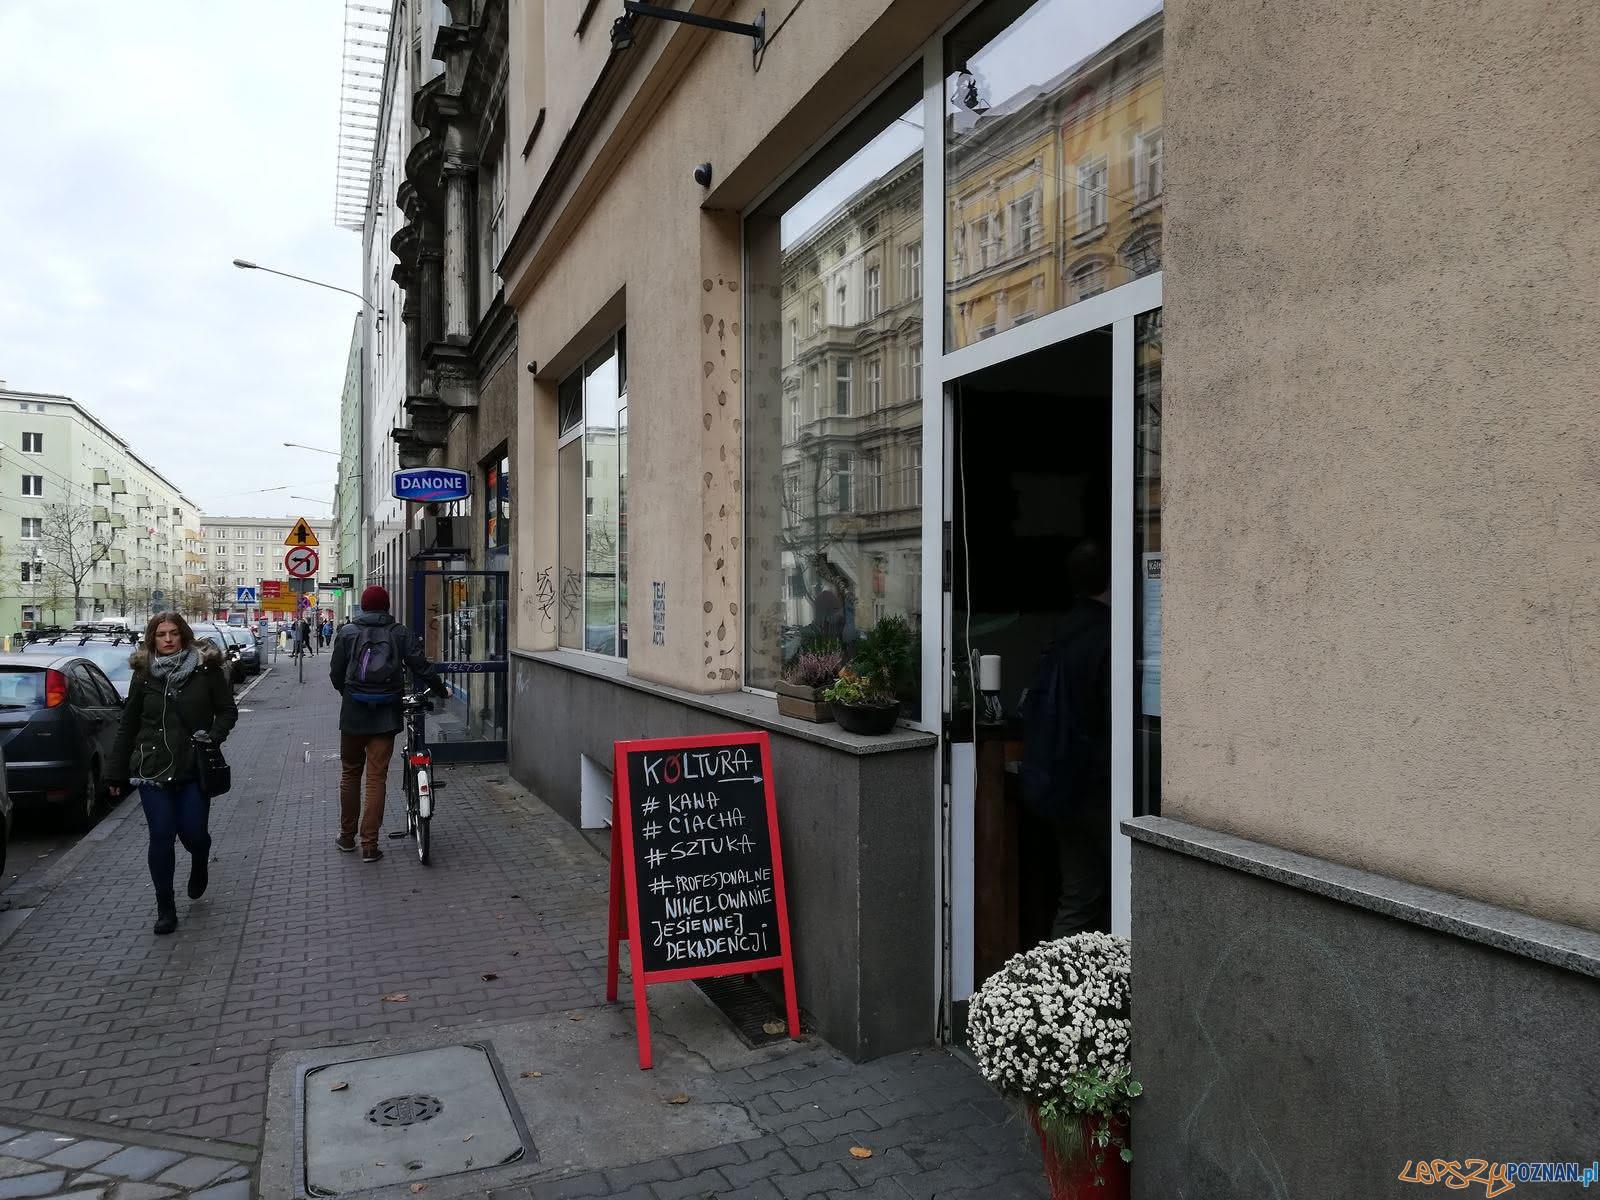 Kawiarnia Kóltura  Foto: T. Dworek